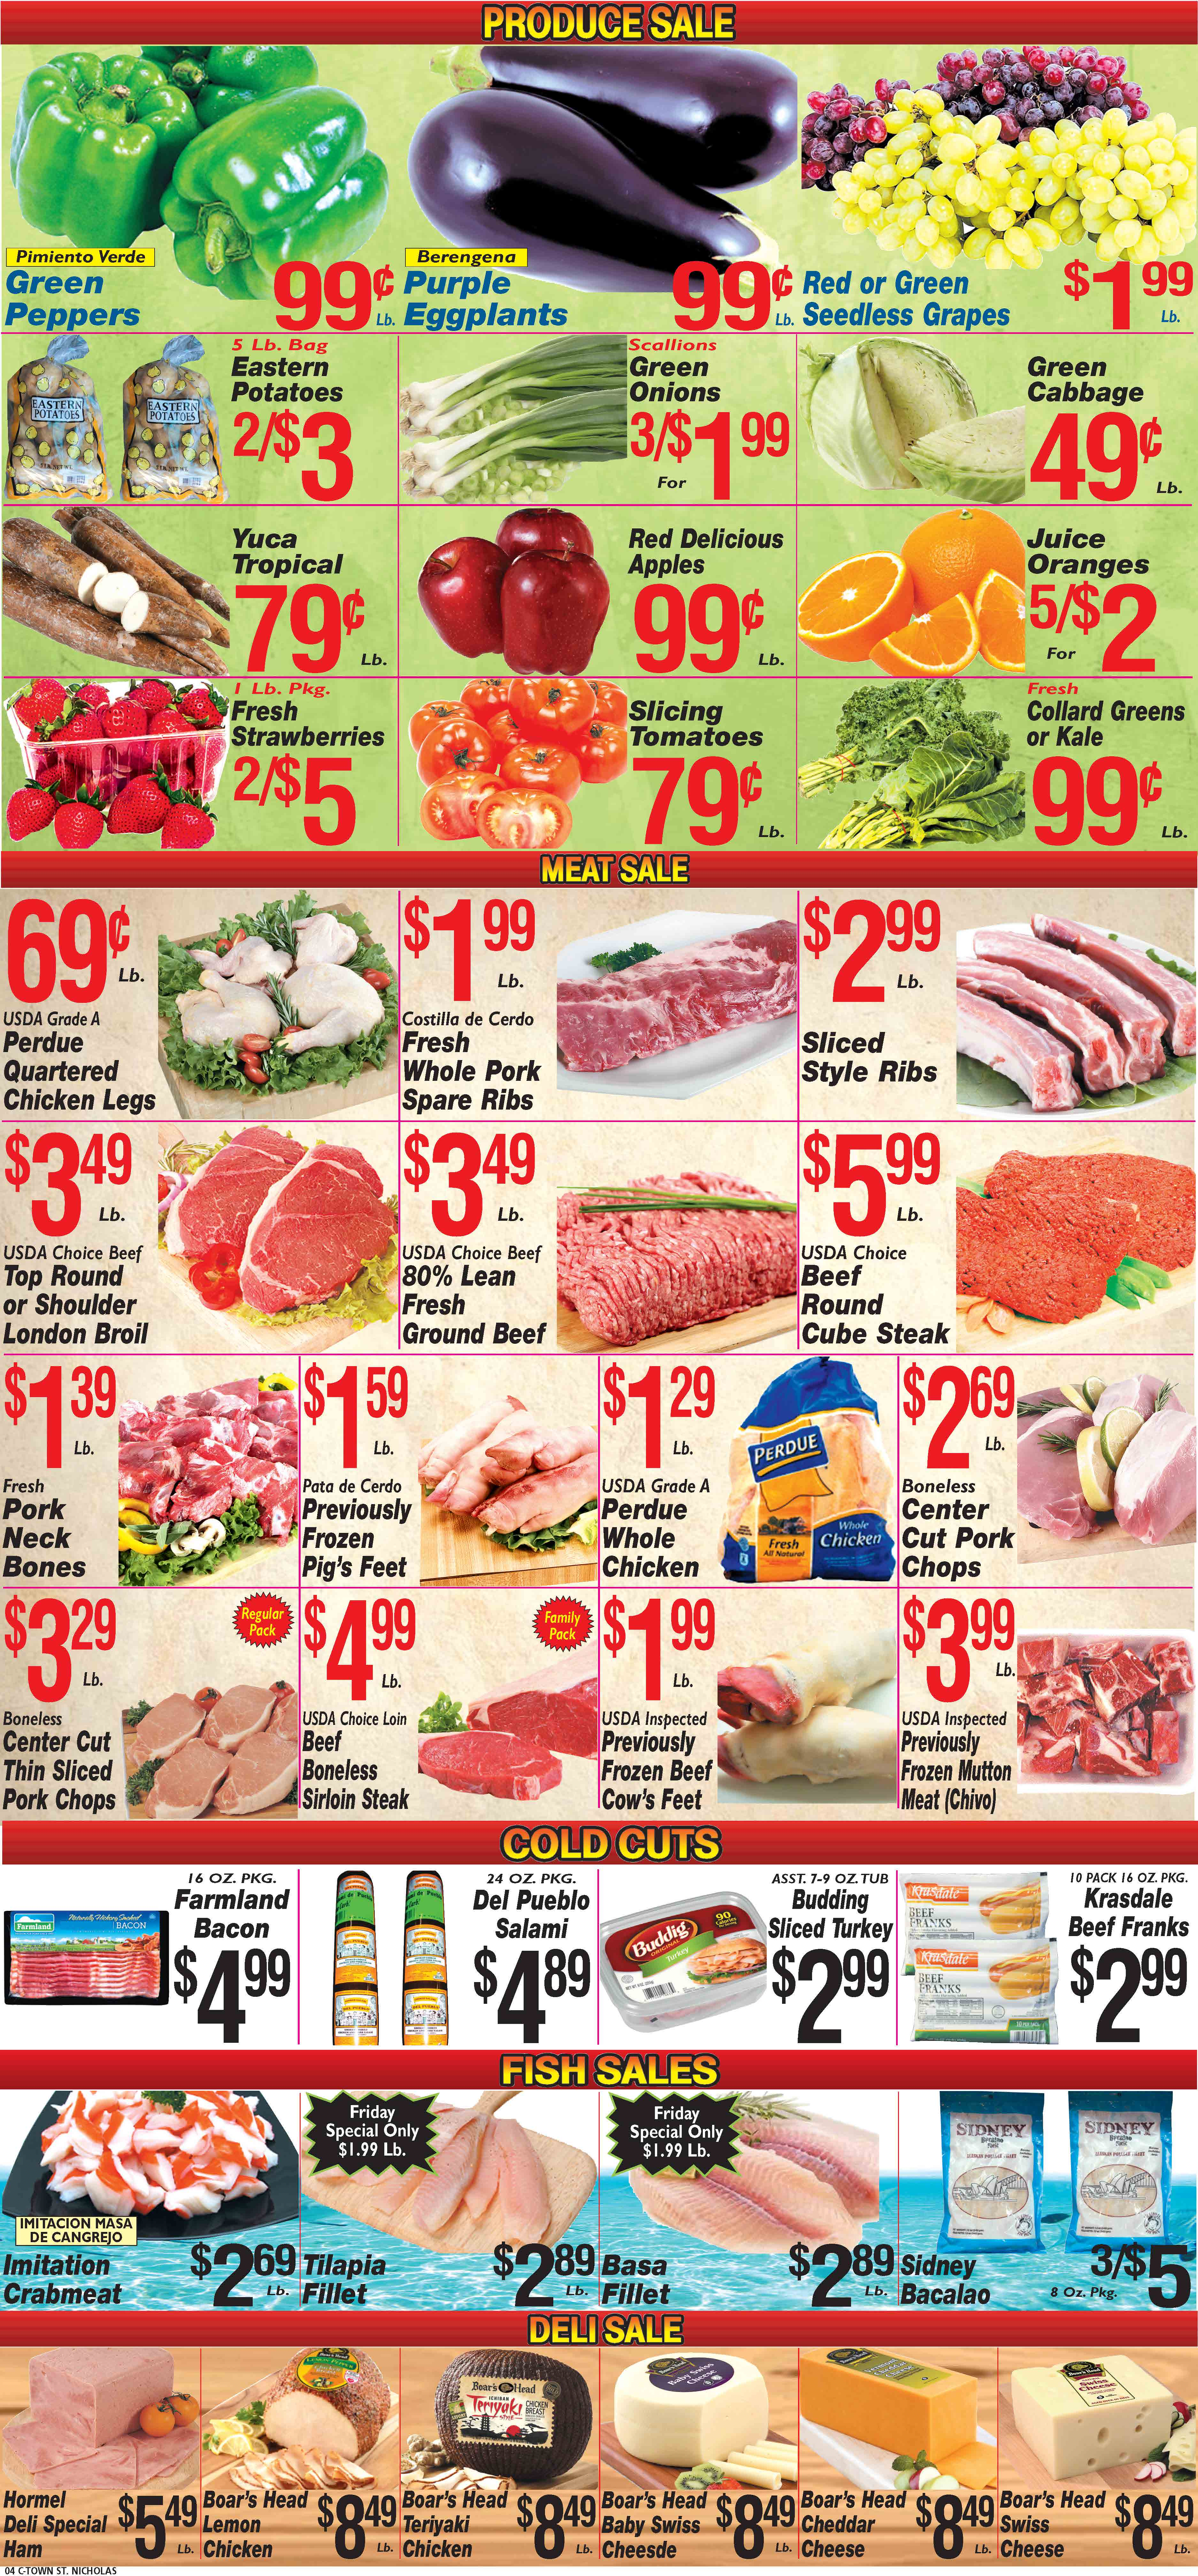 C-Town Supermarket image 3